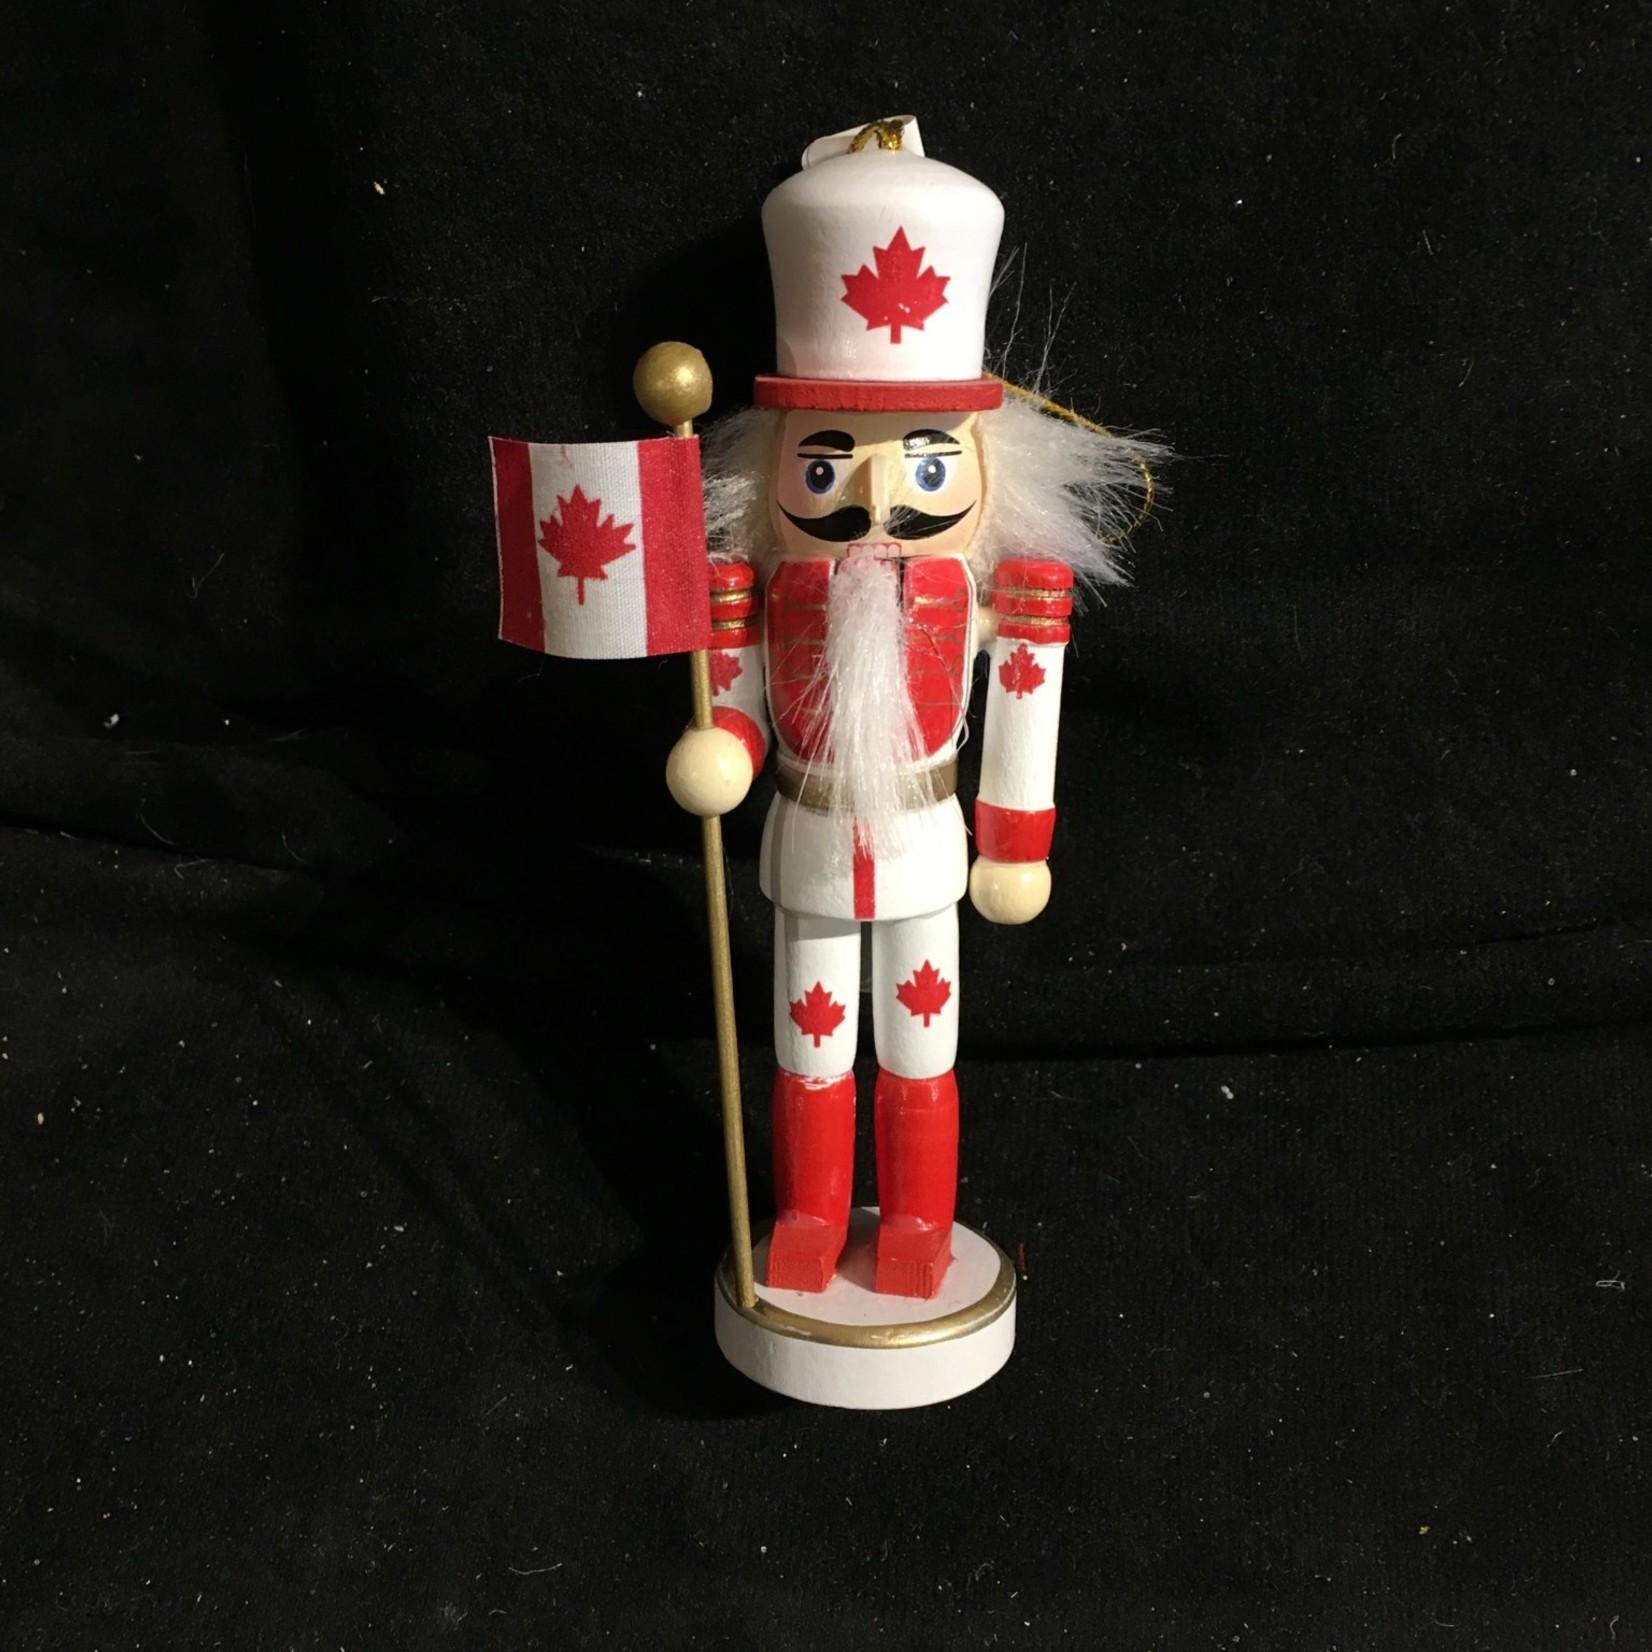 "**5"" Canadian Nutcracker Ornament"